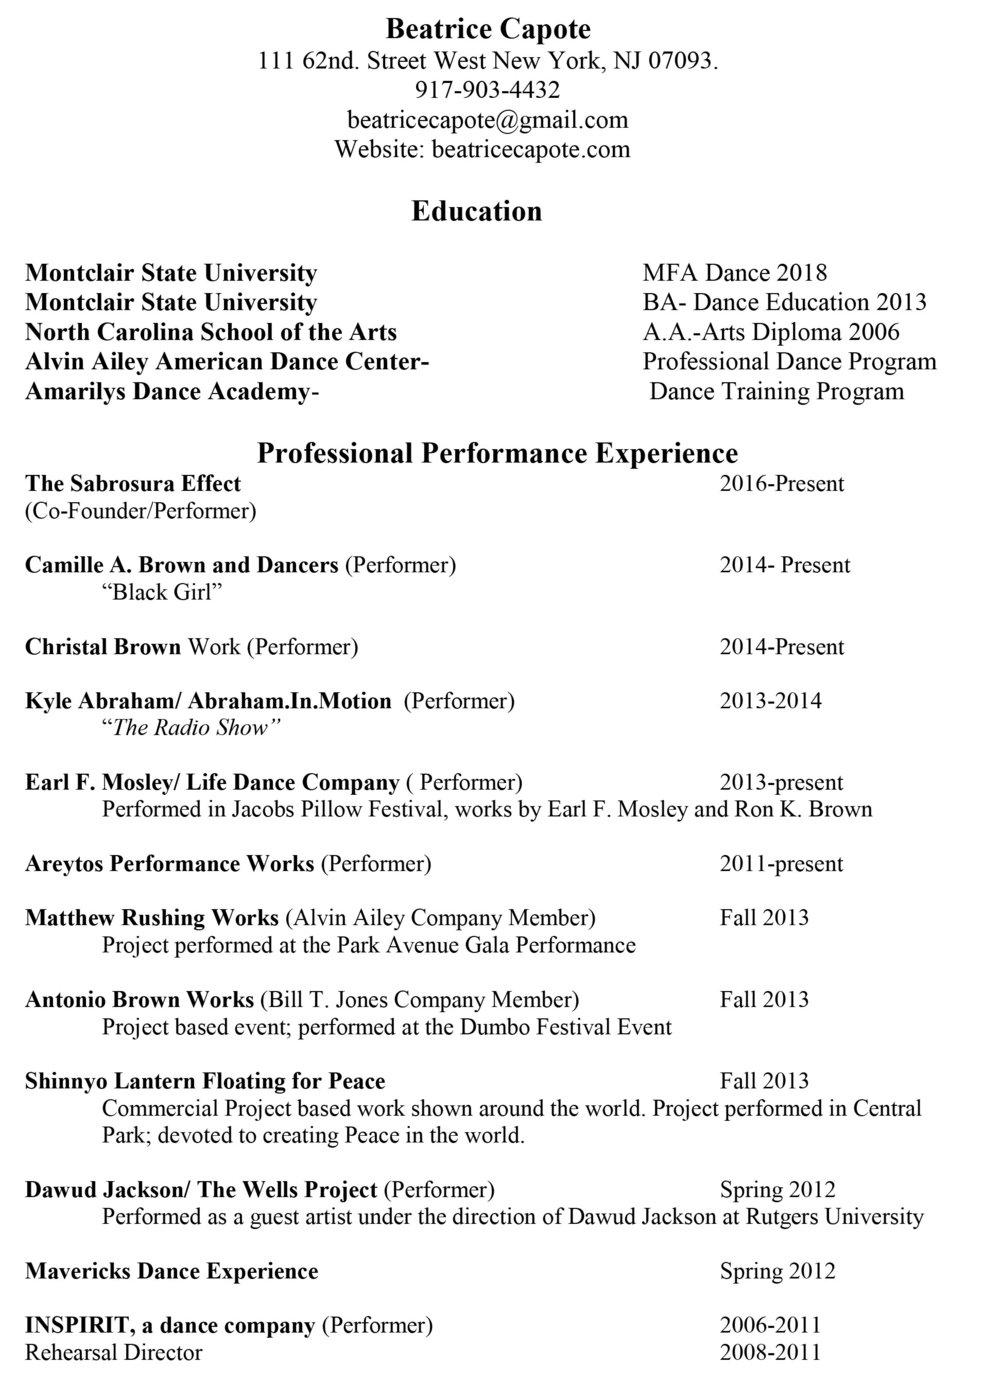 Curriculum Vitae 2-1.jpg